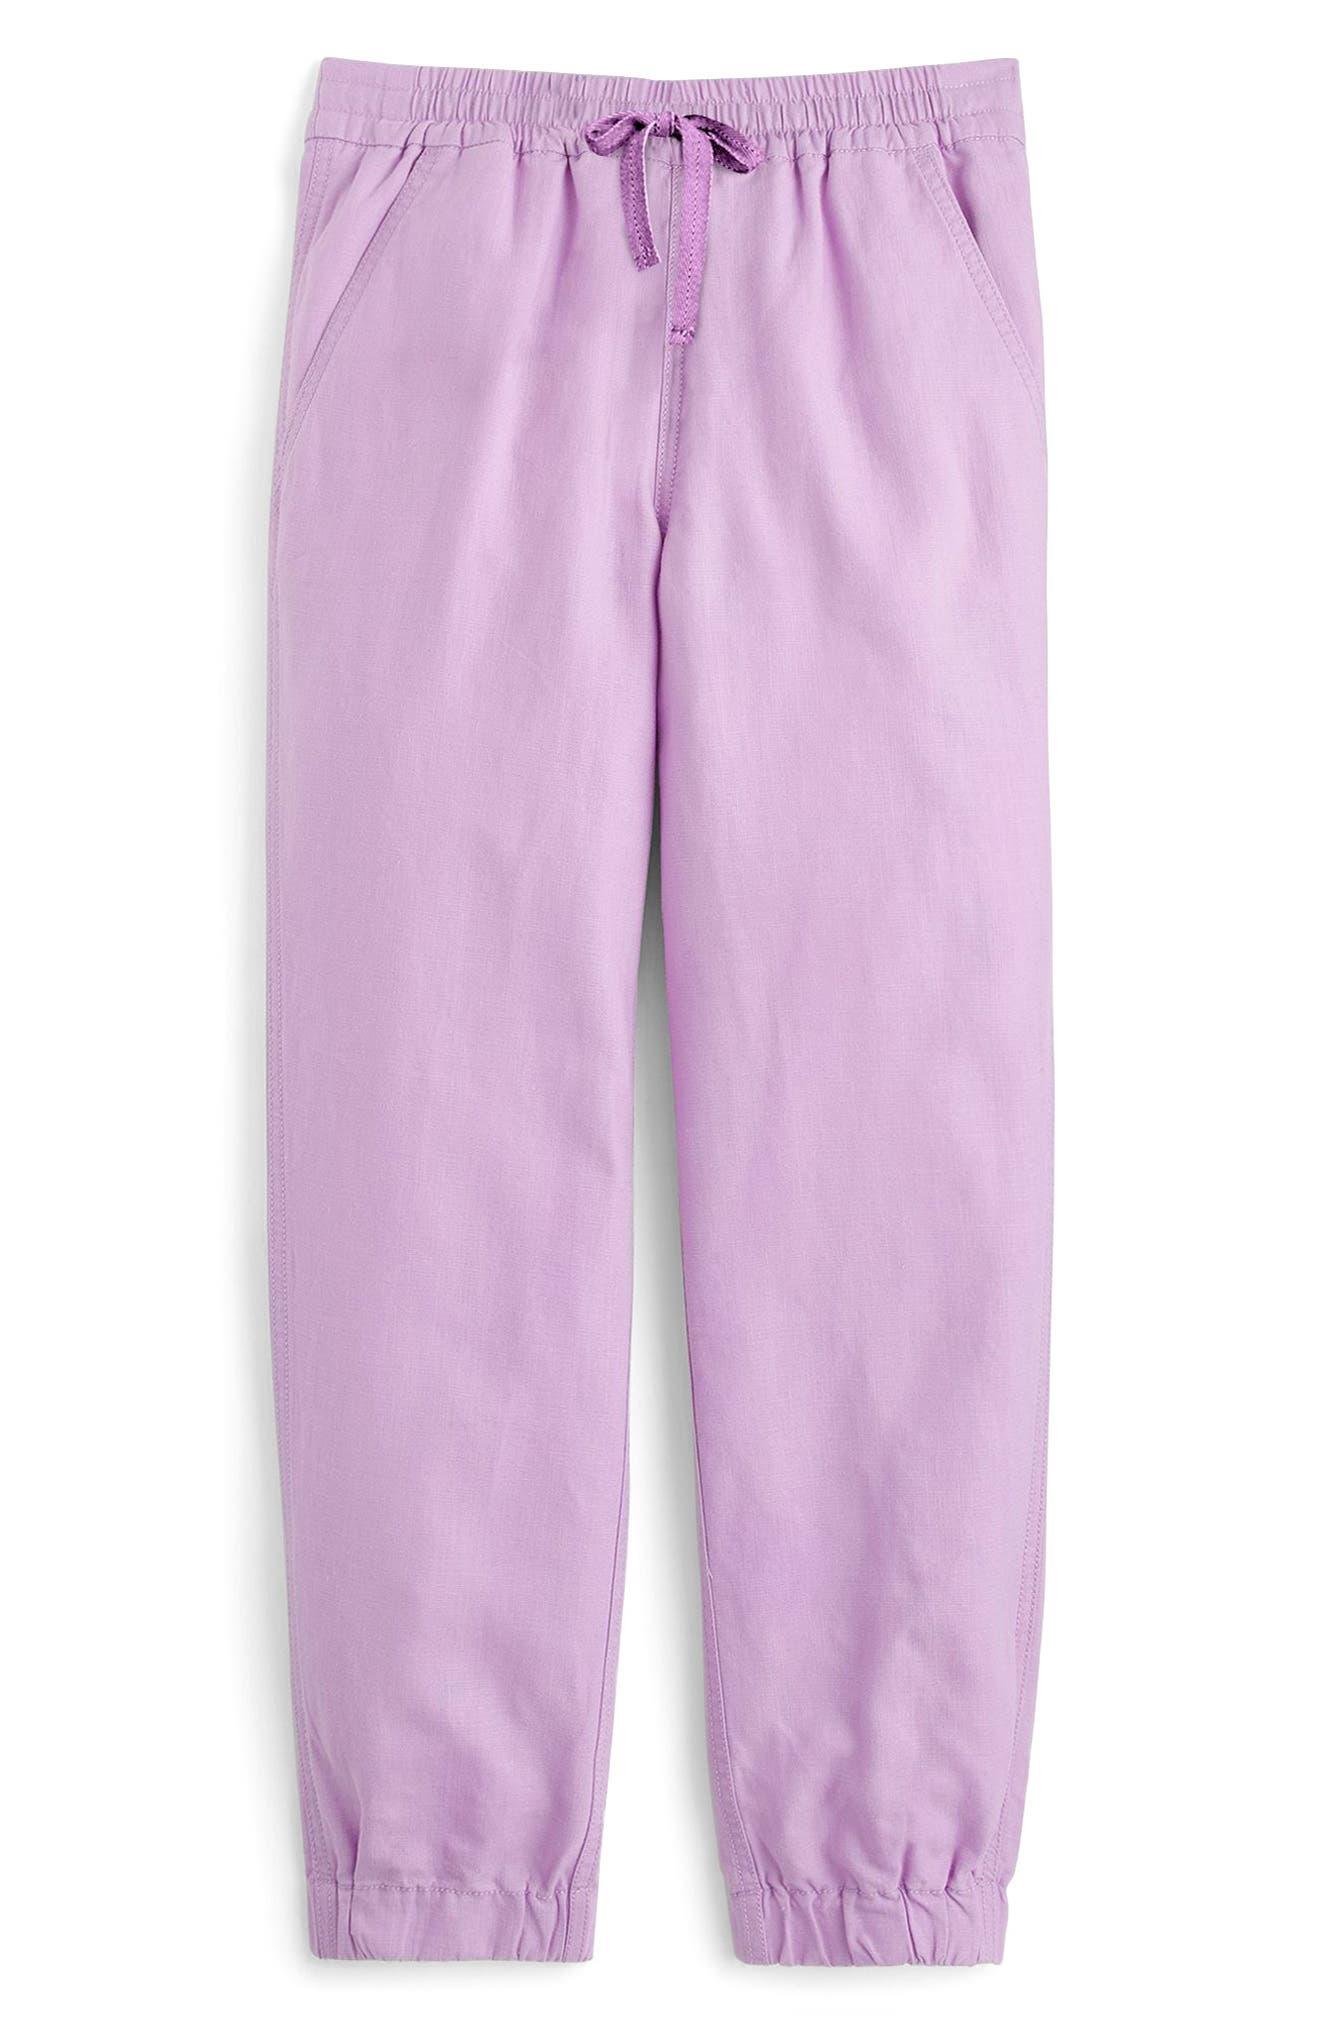 New Seaside Pants,                             Main thumbnail 1, color,                             Faded Lavender